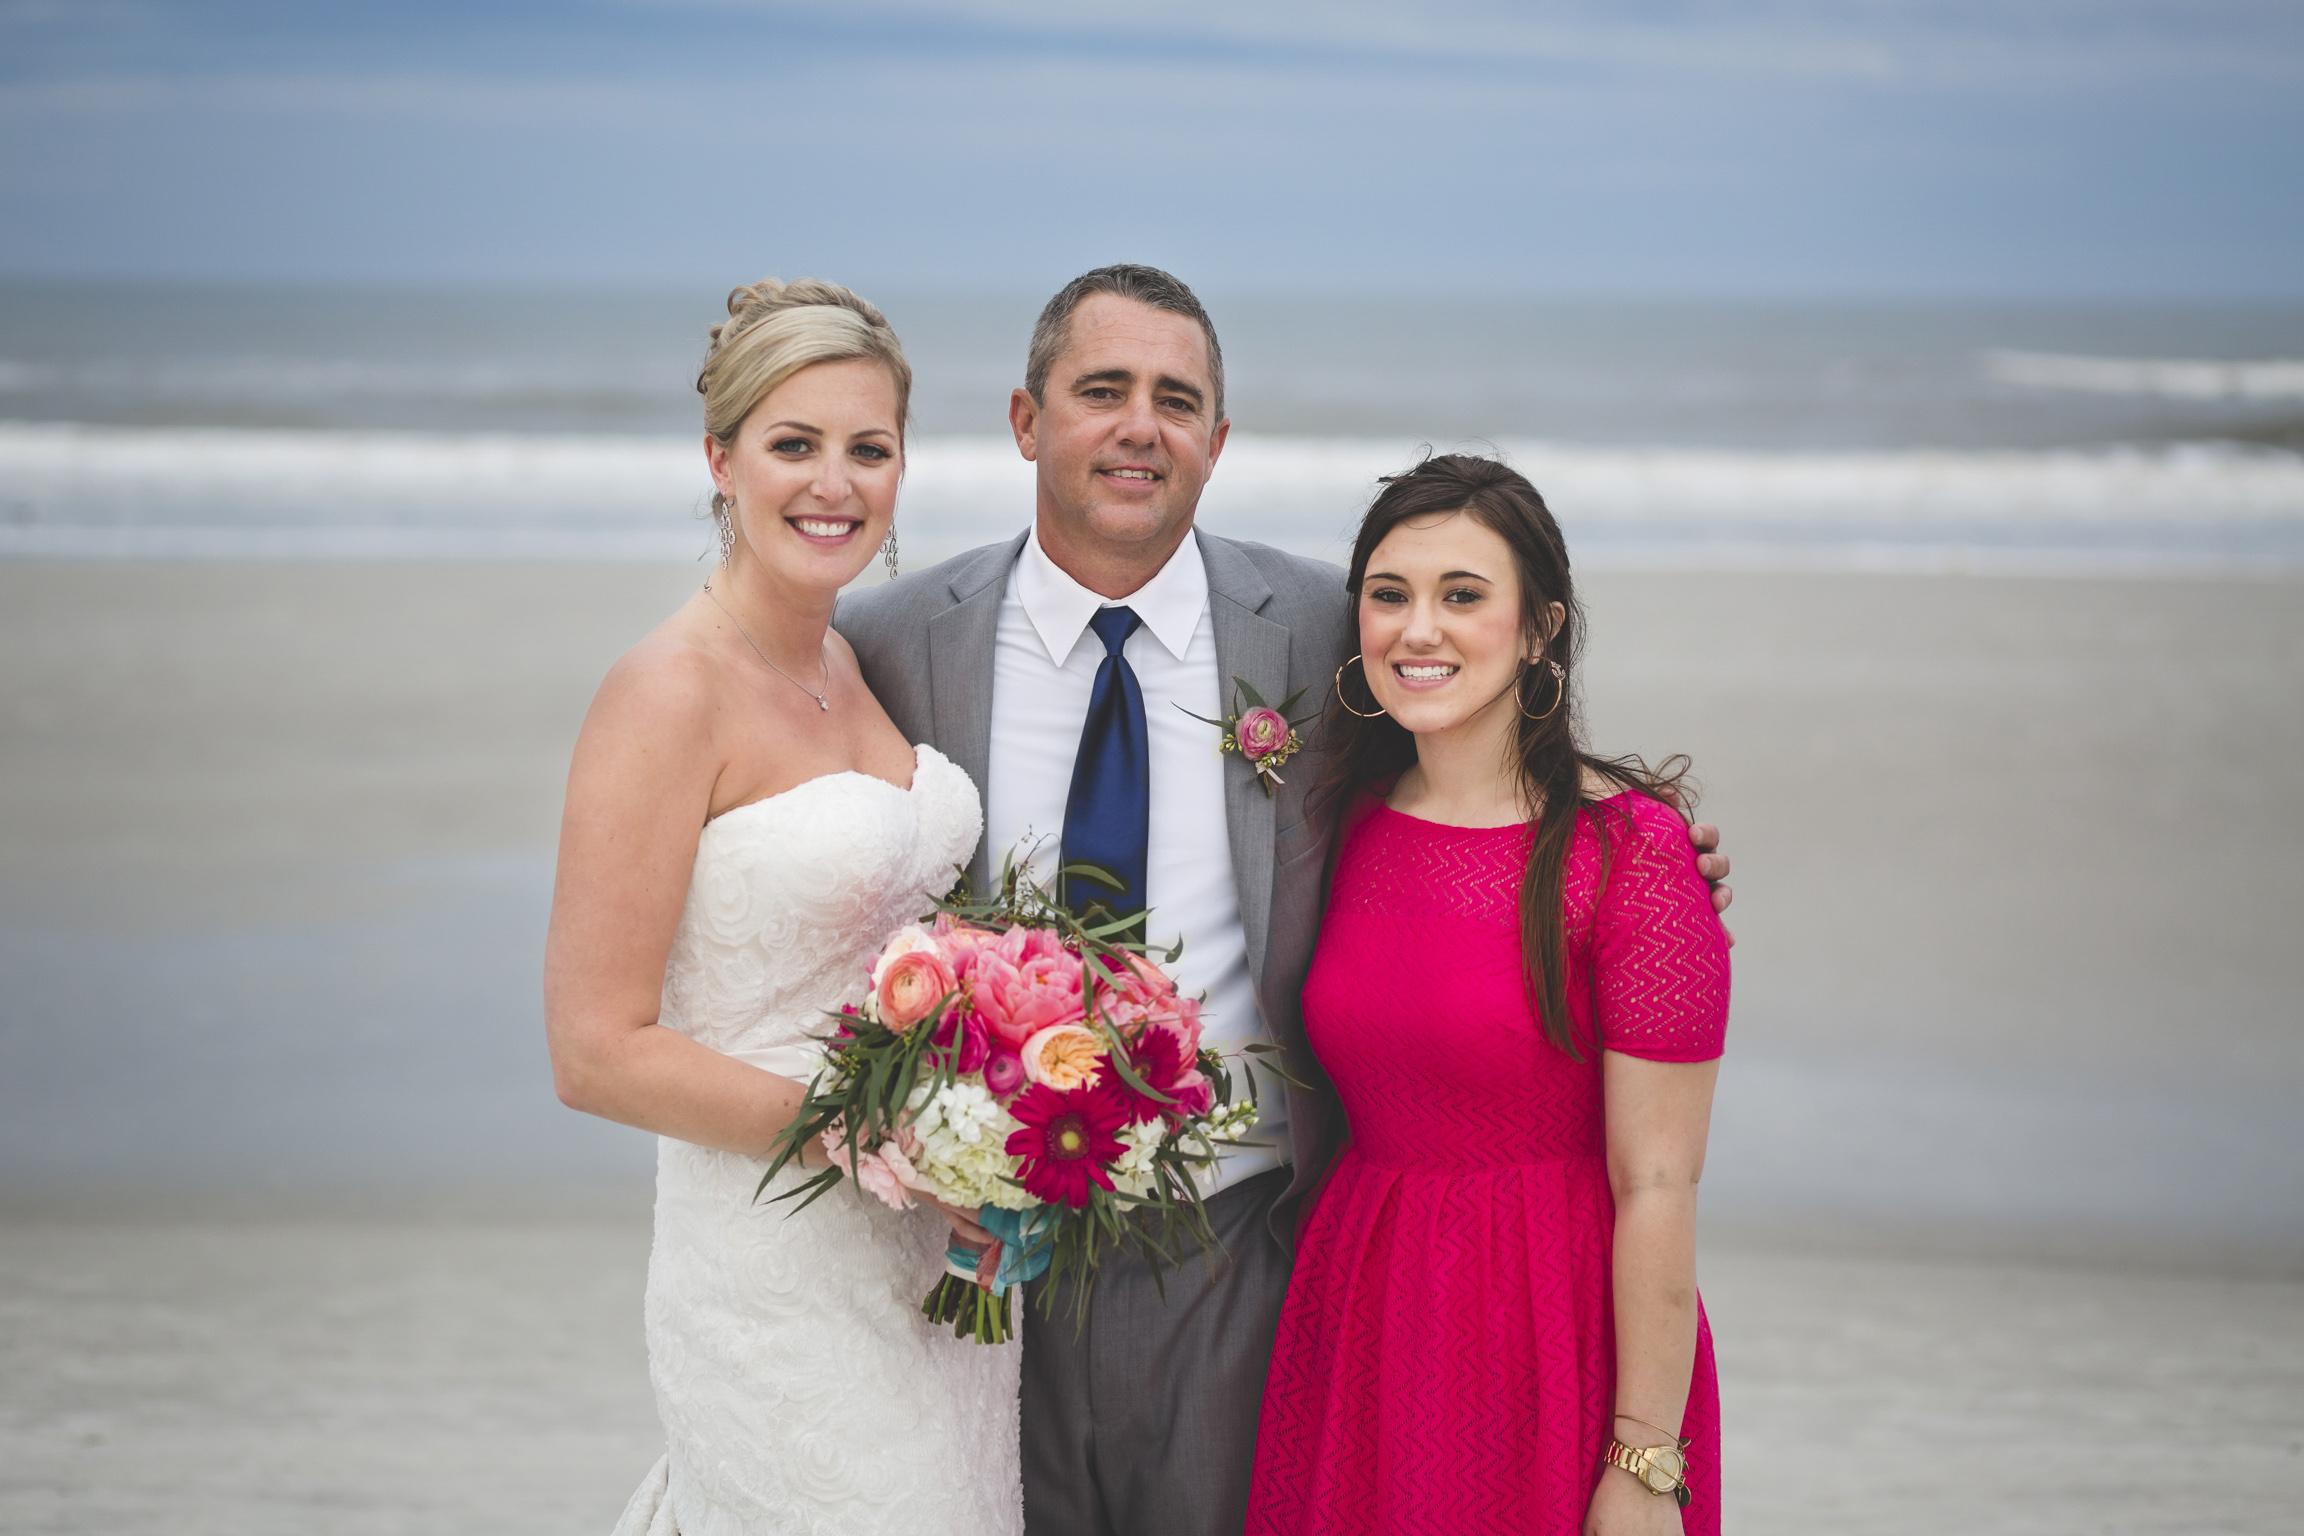 adam-szarmack-casa-marina-wedding-photographer-jacksonville-beach-florida-40.jpg